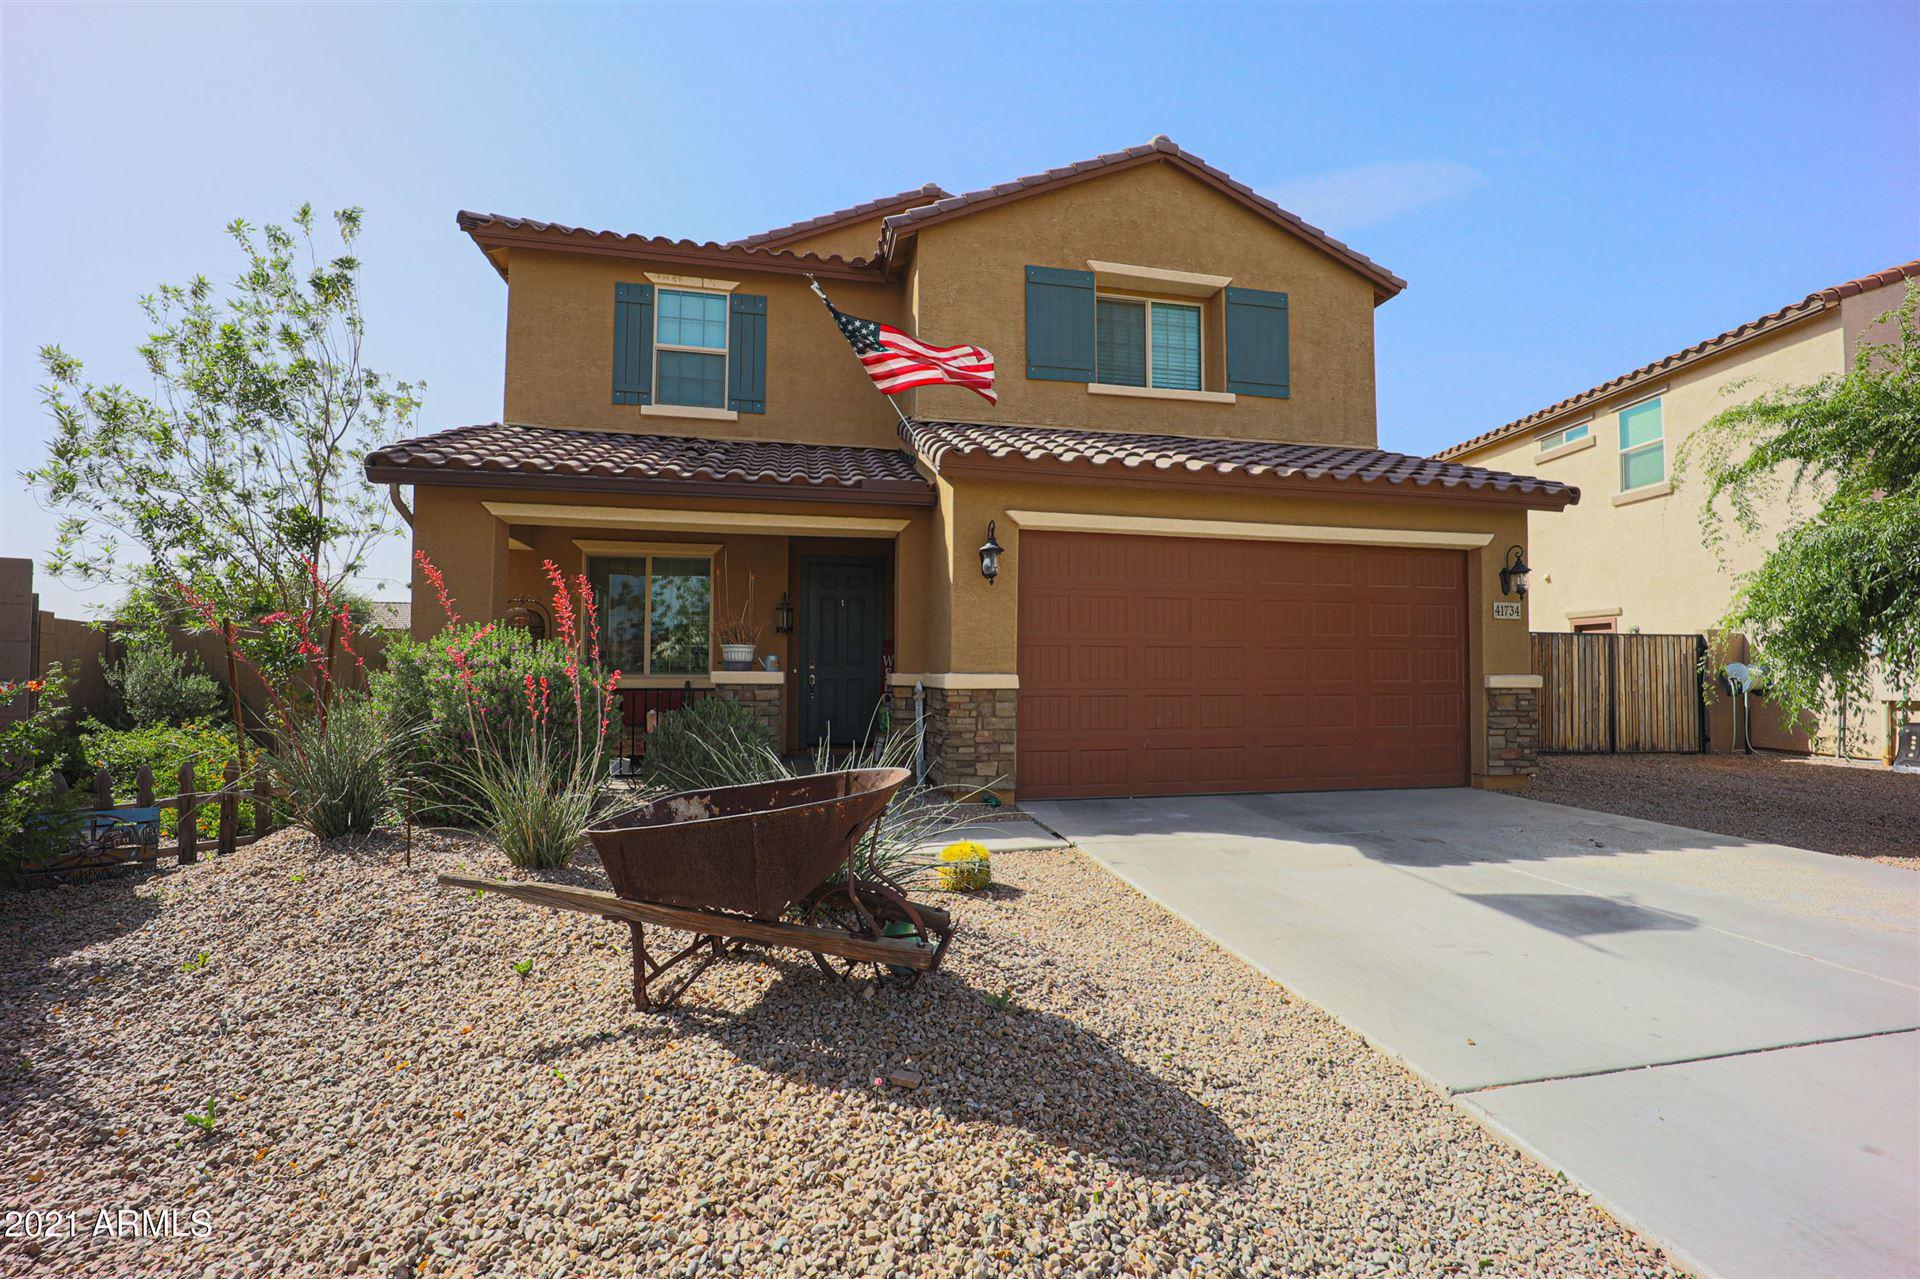 41734 N CIELITO LINDA Way, San Tan Valley, AZ 85140 - MLS#: 6222540